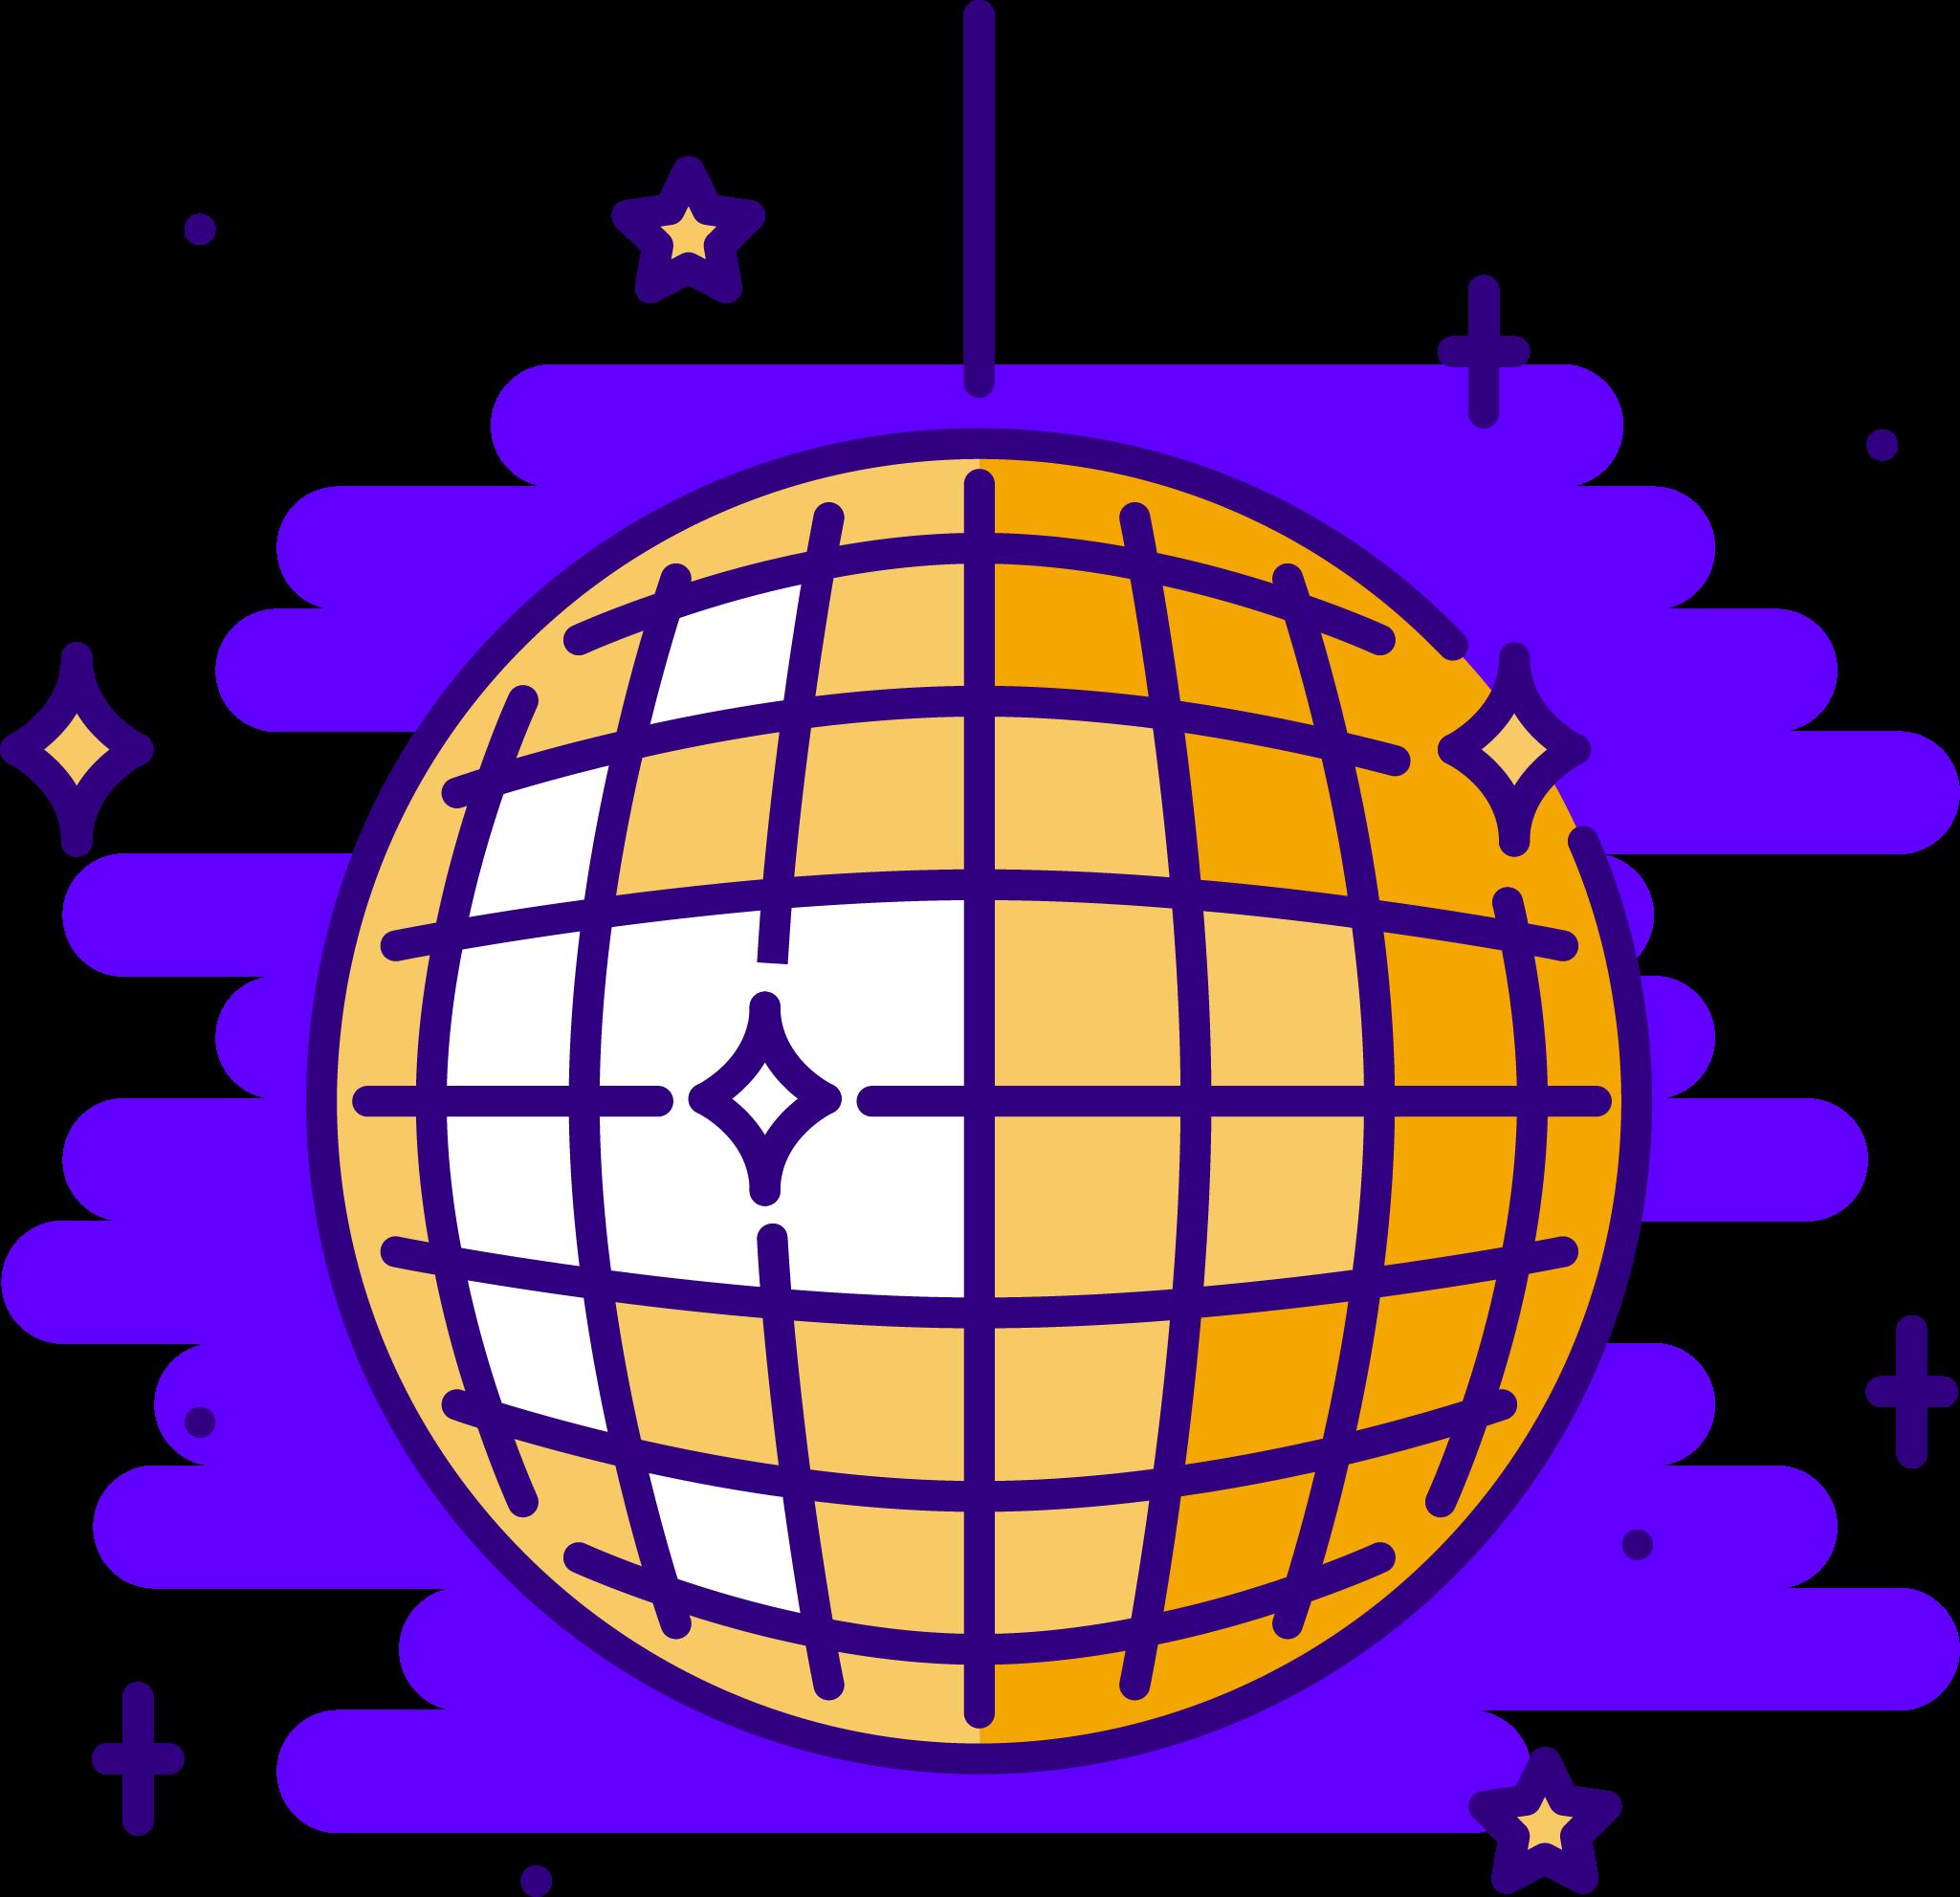 A discoball